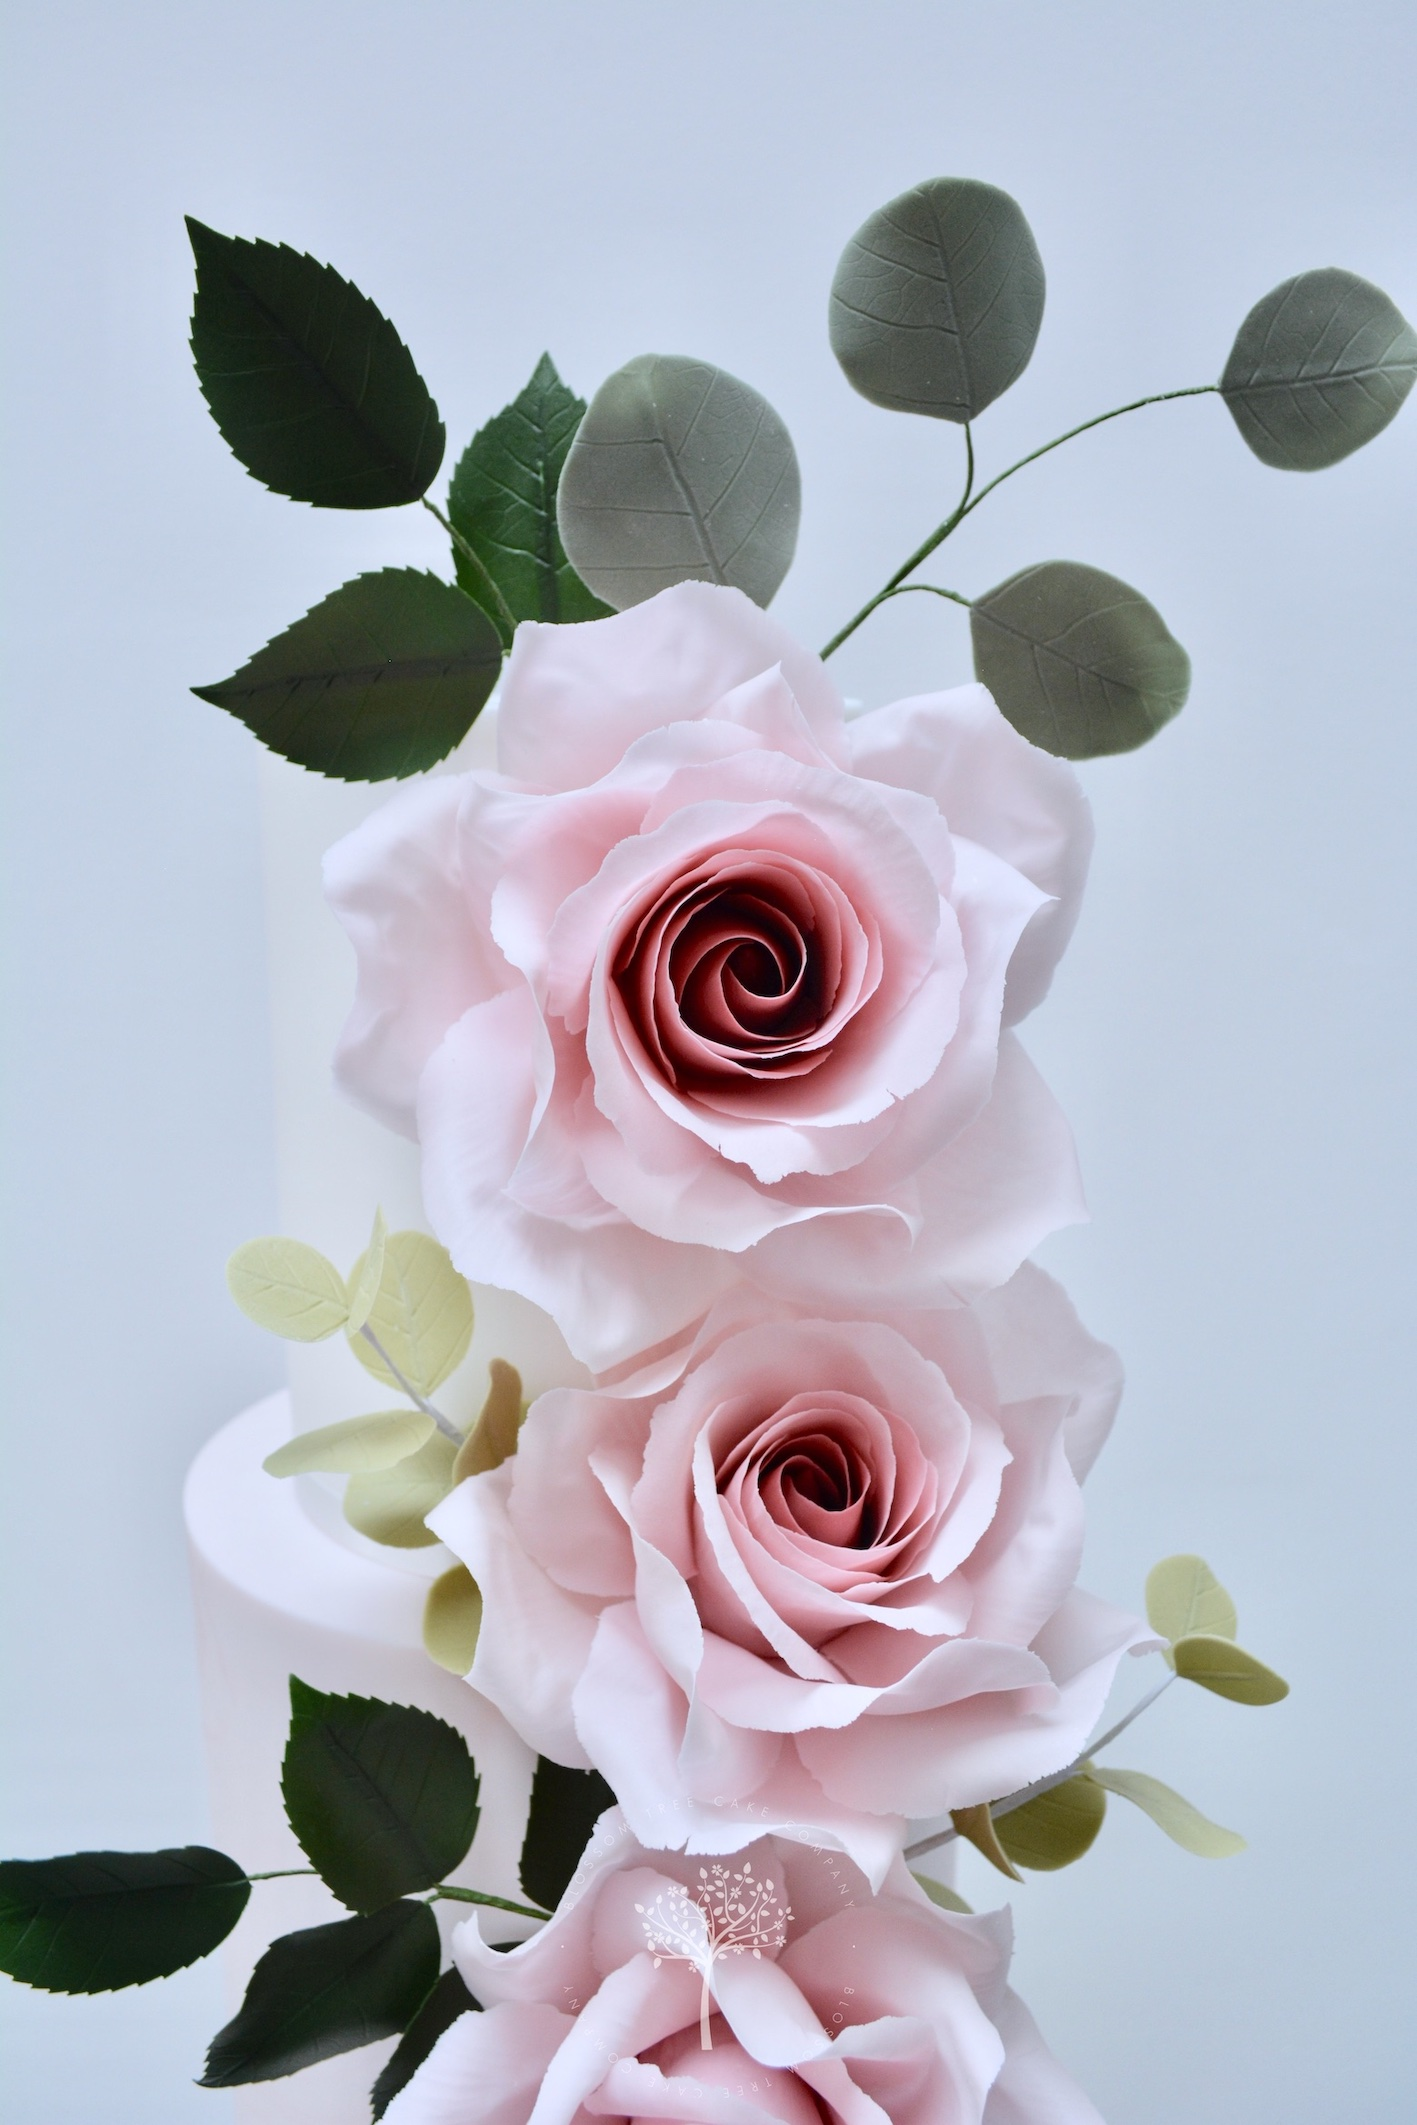 Garden Rose wedding cake by Blossom Tree Cake Company Harrogate North Yorkshire - top sugar rose.jpg